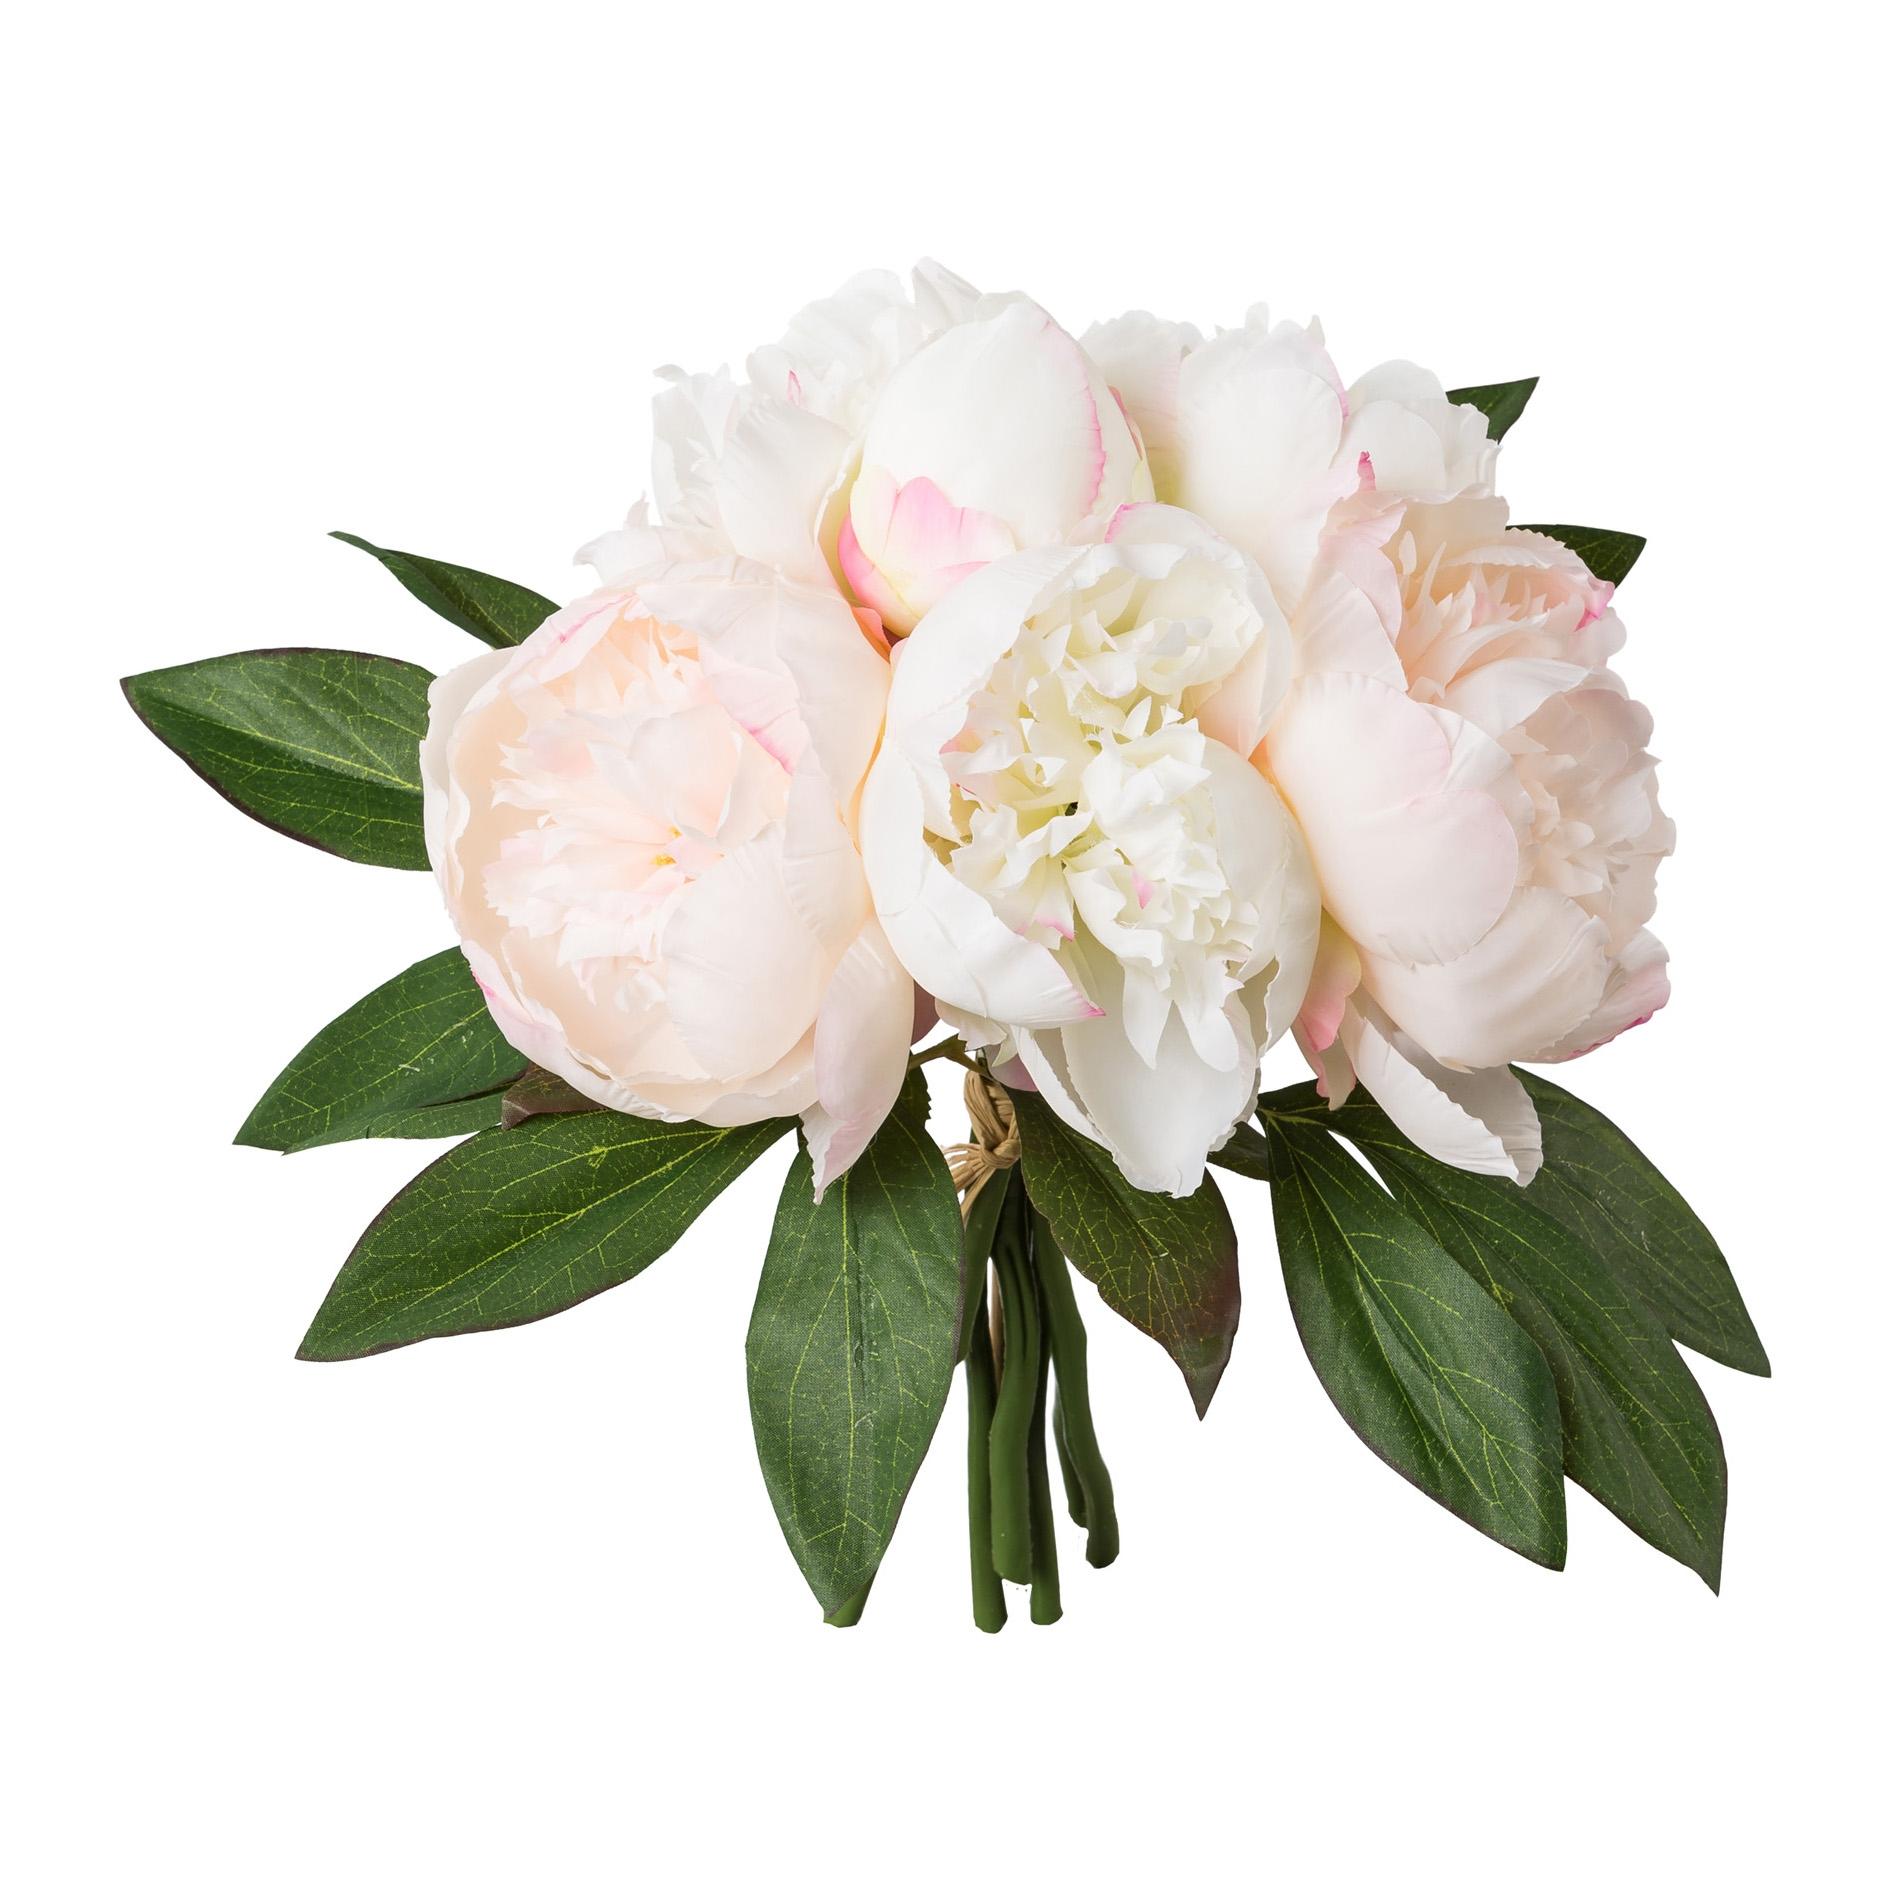 Buchet flori artificiale Peonia Roz deschis, 32 cm imagine